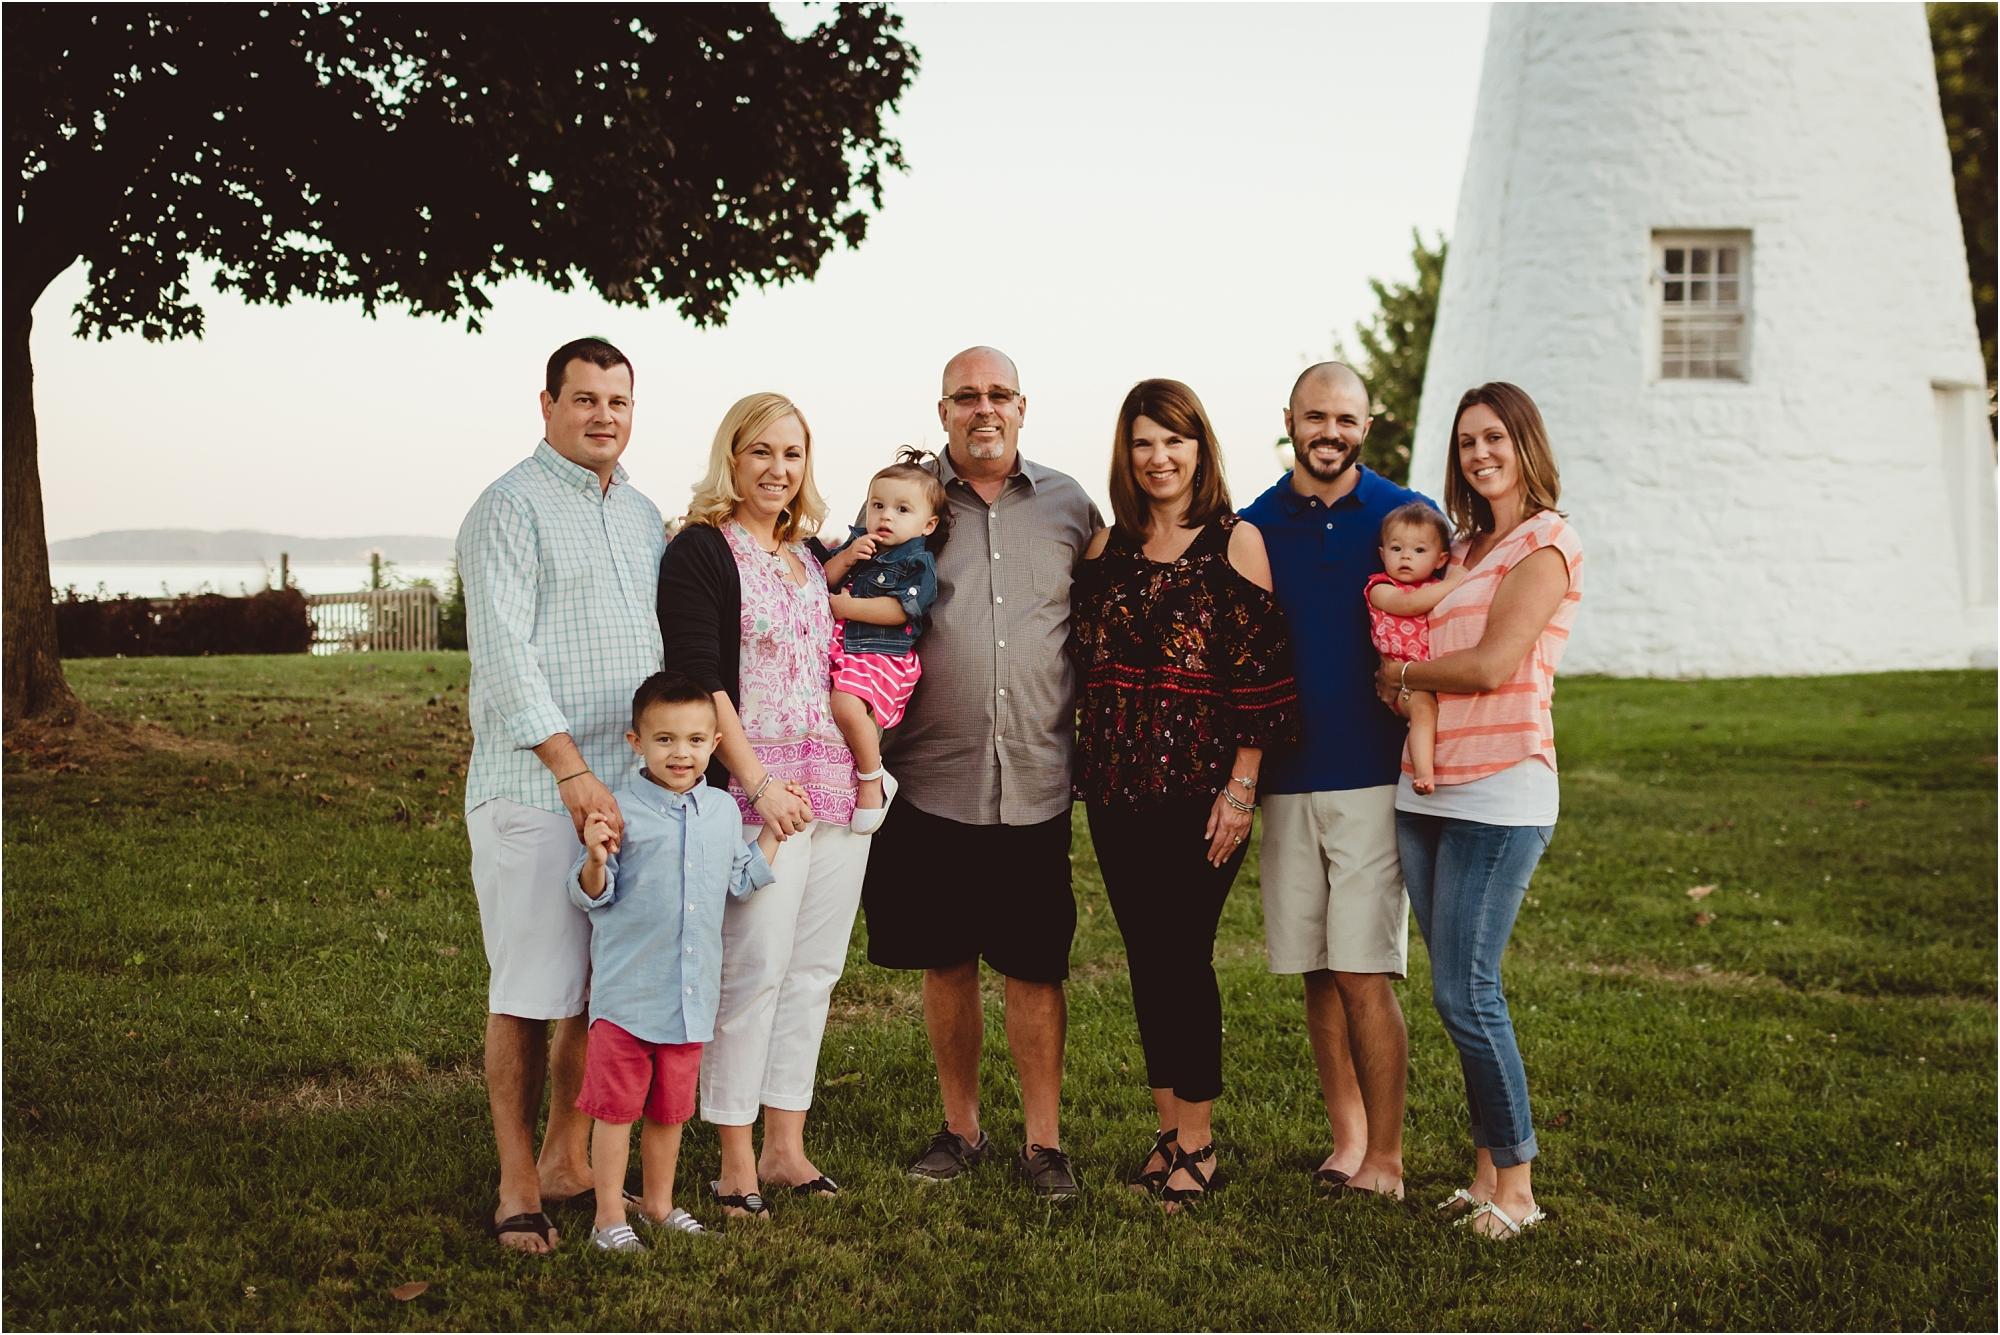 bnp-madden-family-portraits-concord-point-lighthouse.jpg